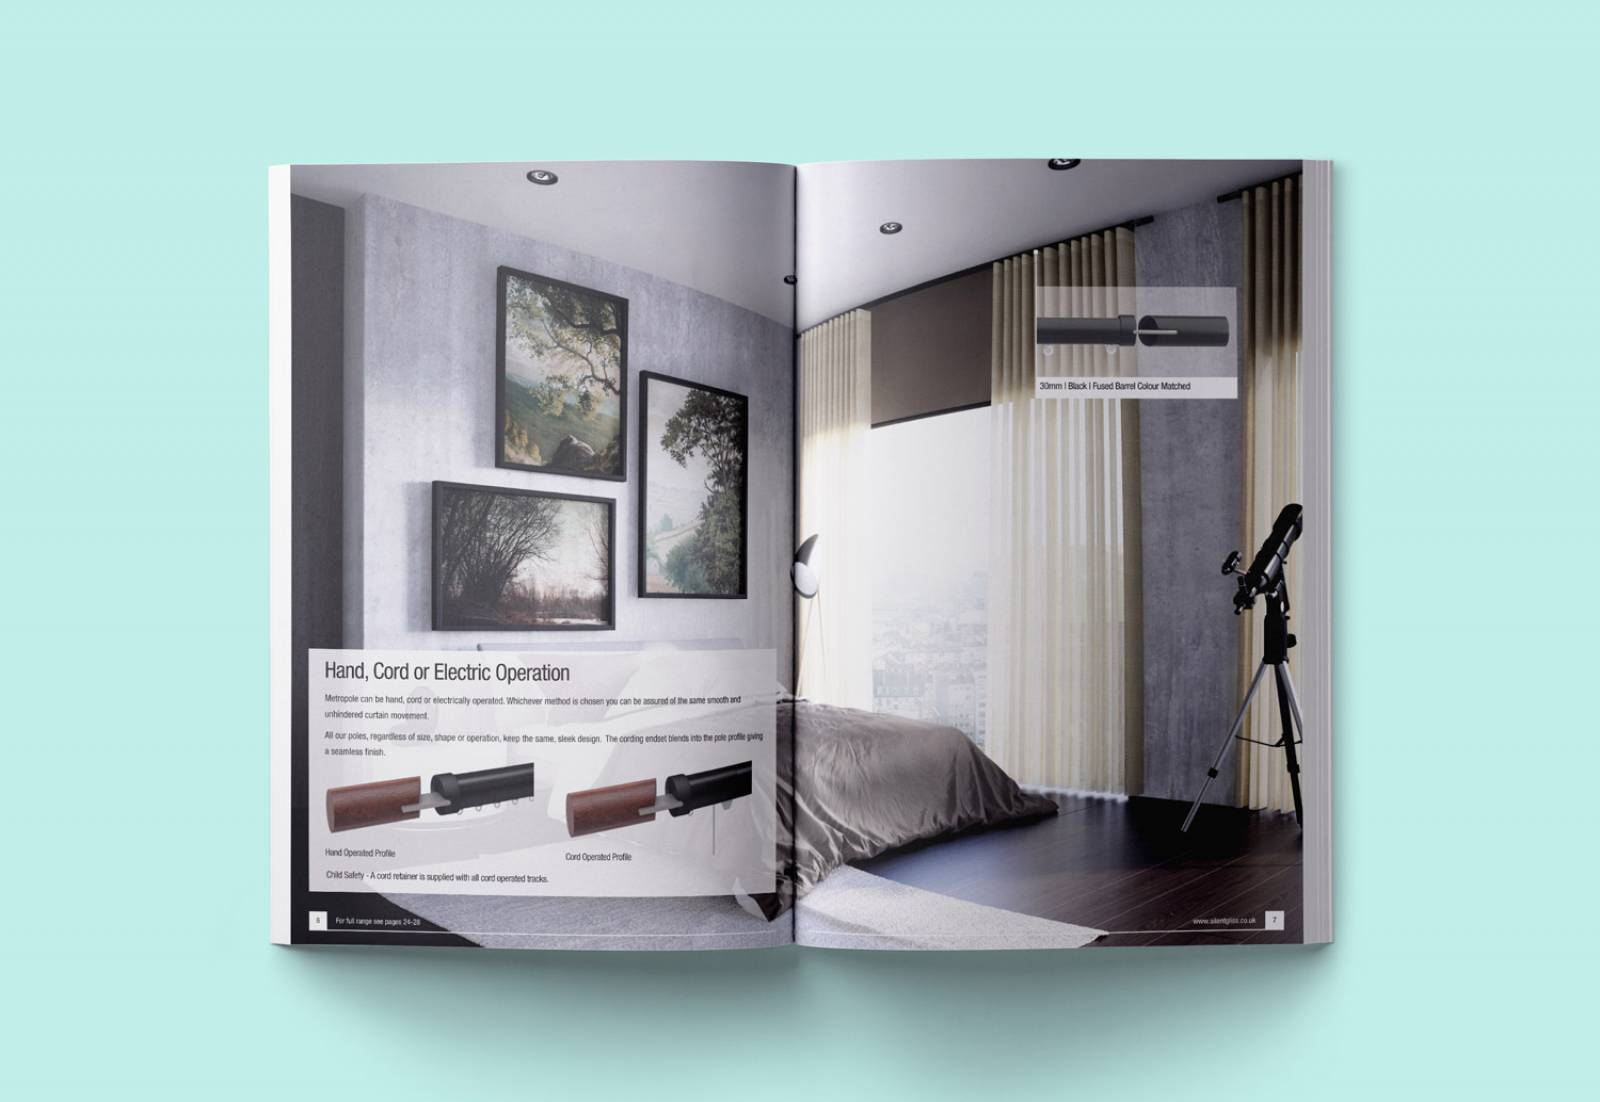 Silent-gliss-brochure-3-design-agency-graphic-design-canterbury.jpg